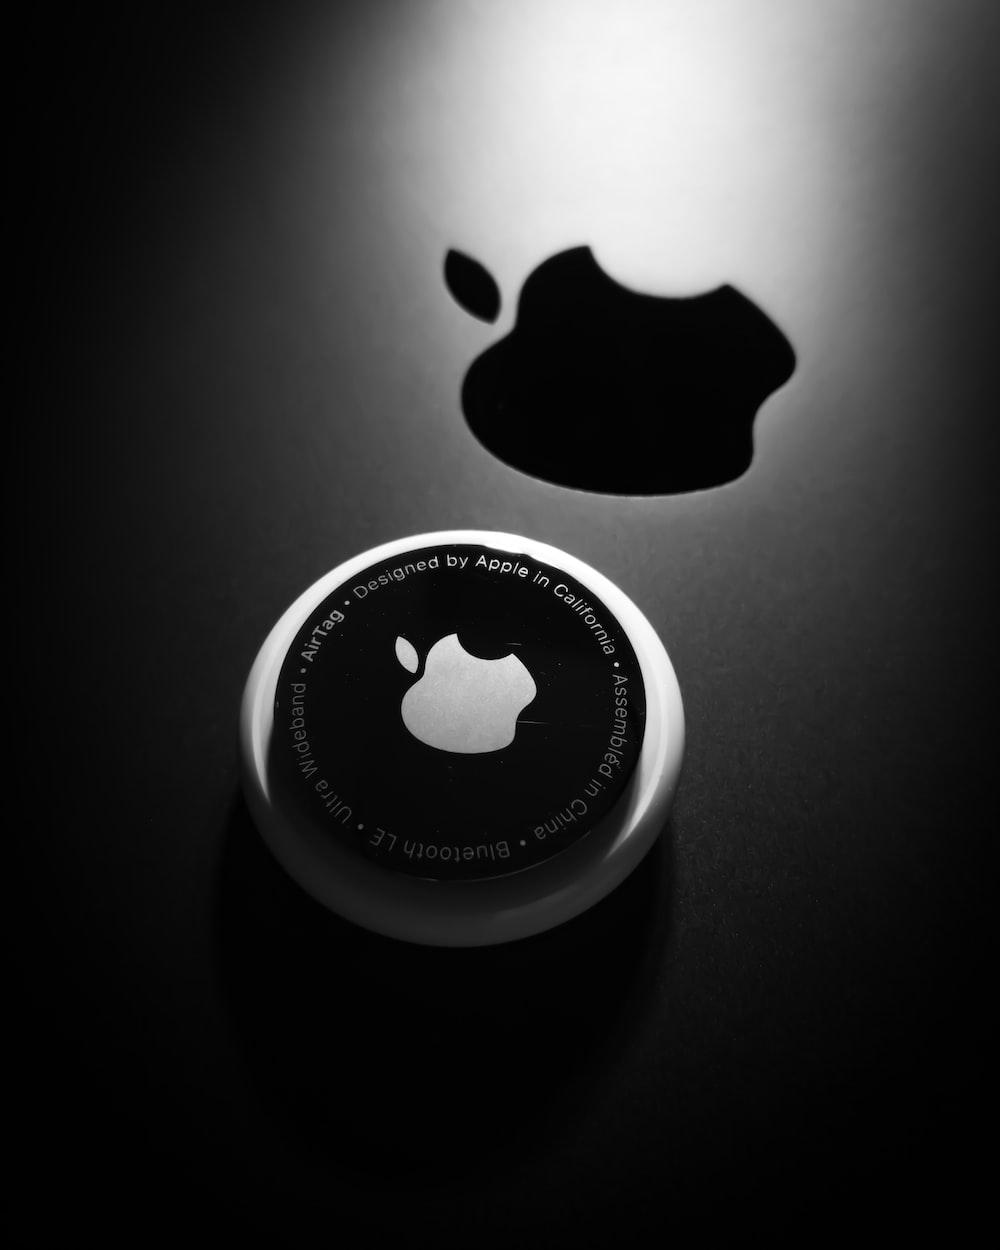 black and white apple logo